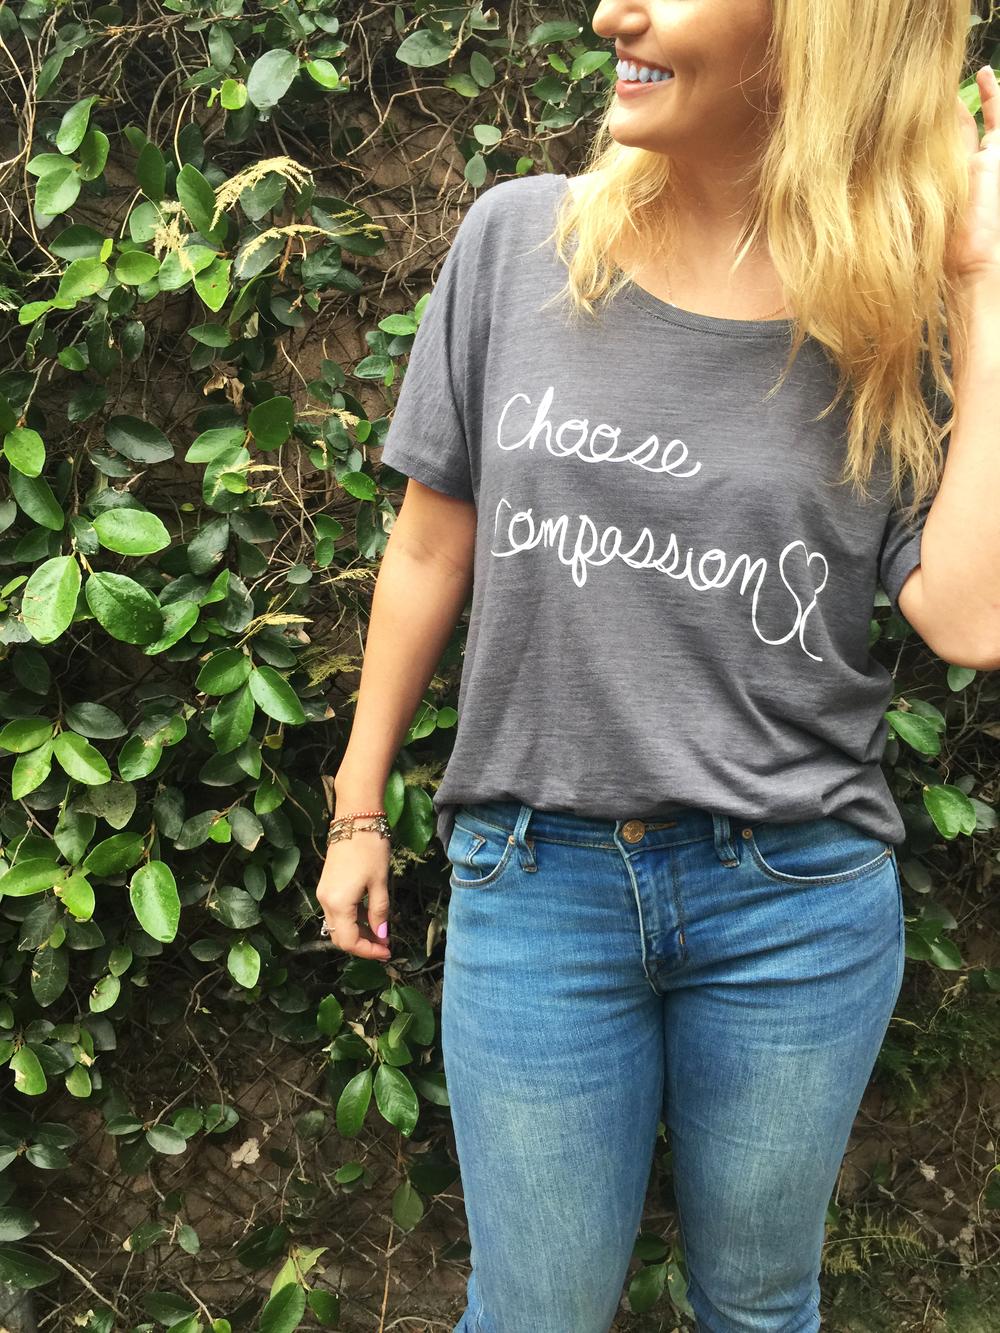 ChooseCompassion_Close.jpg